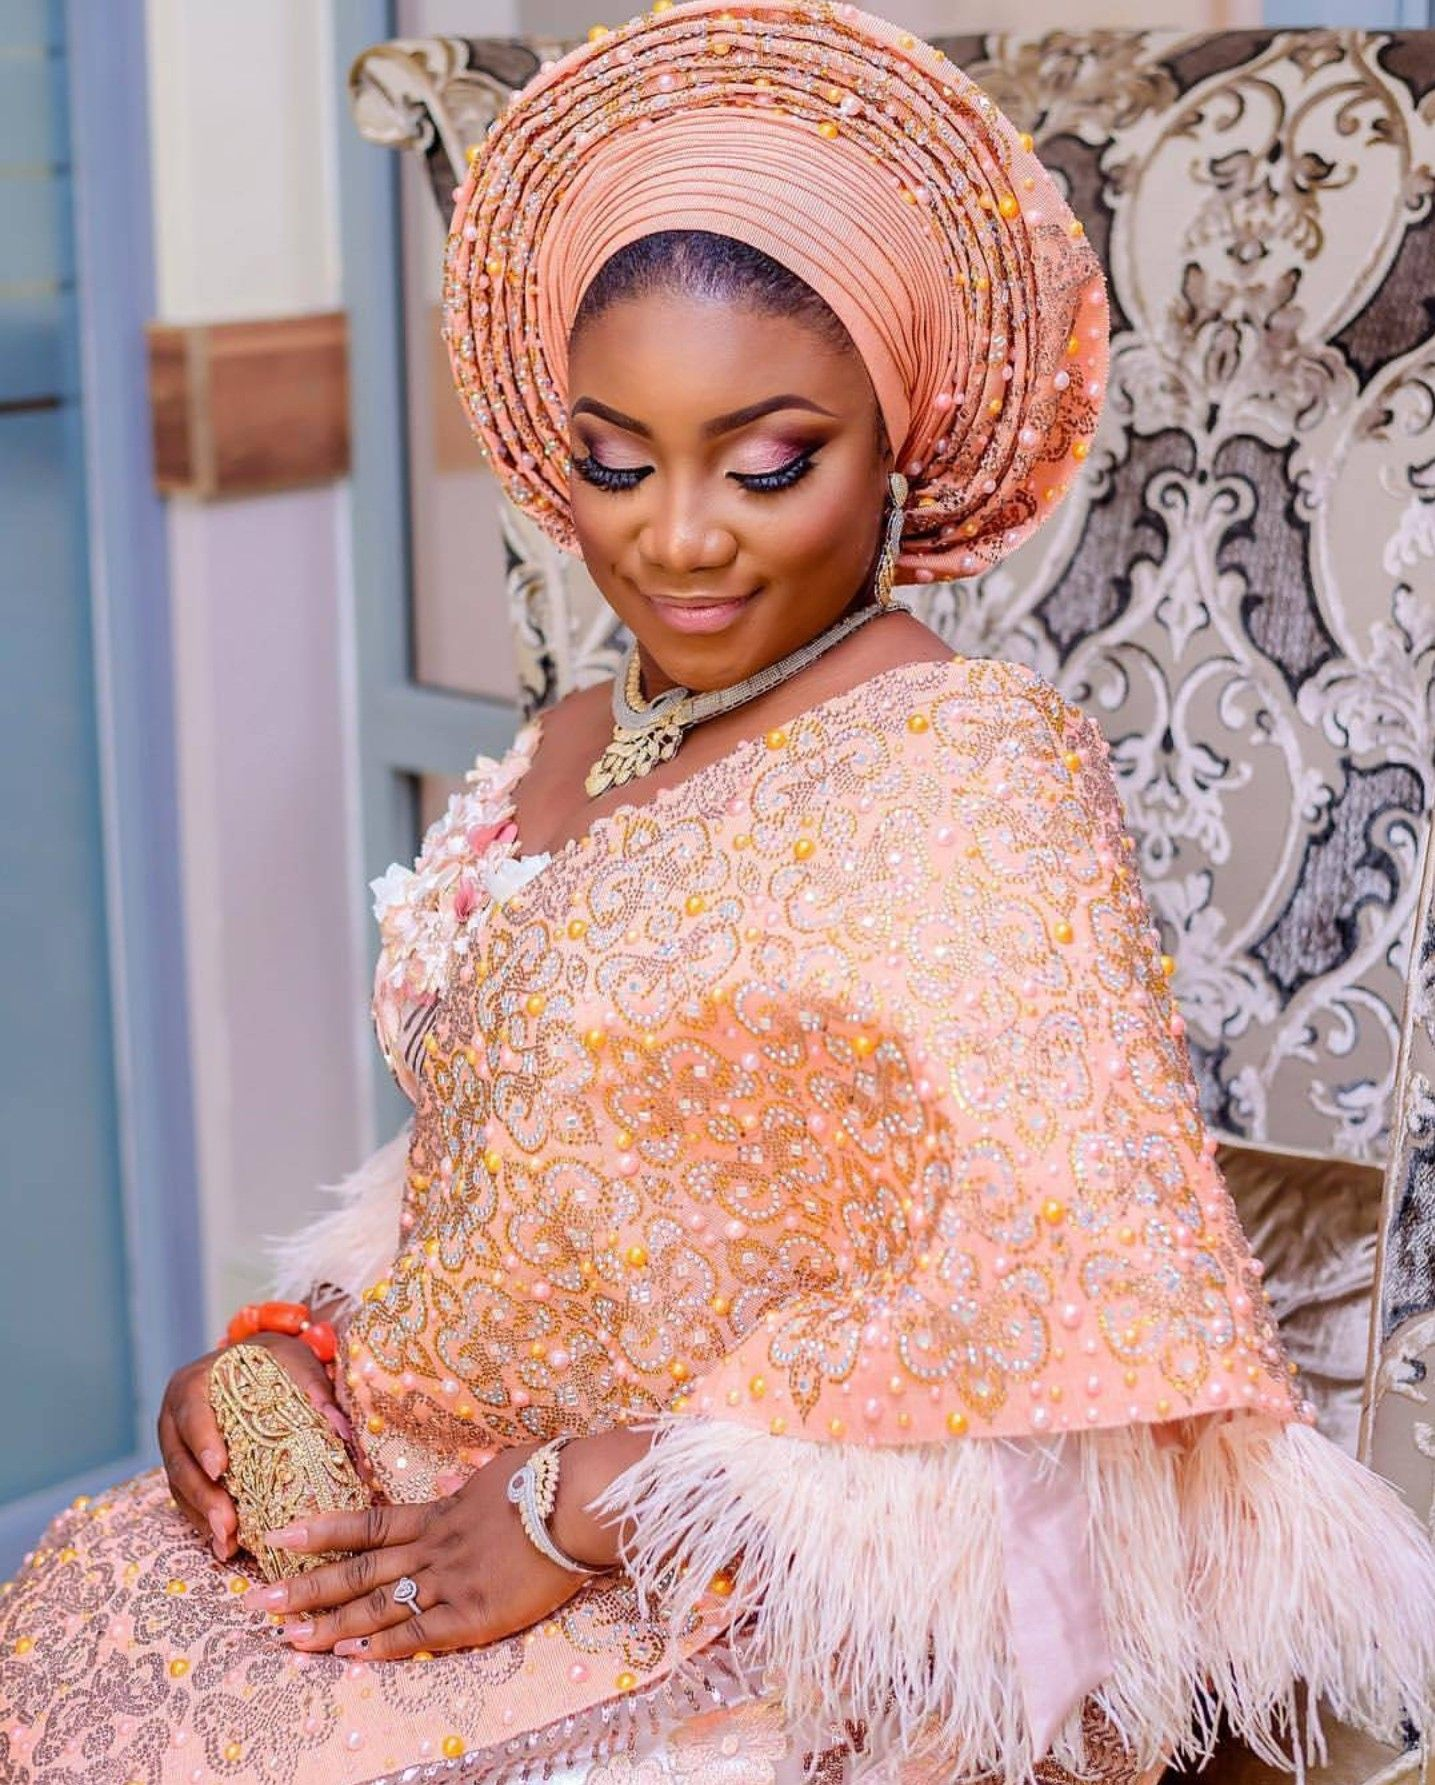 Traditional nigerian wedding dresses  Pin by Mercy Kumordzi on mecrkup  Pinterest  Nigerian bride